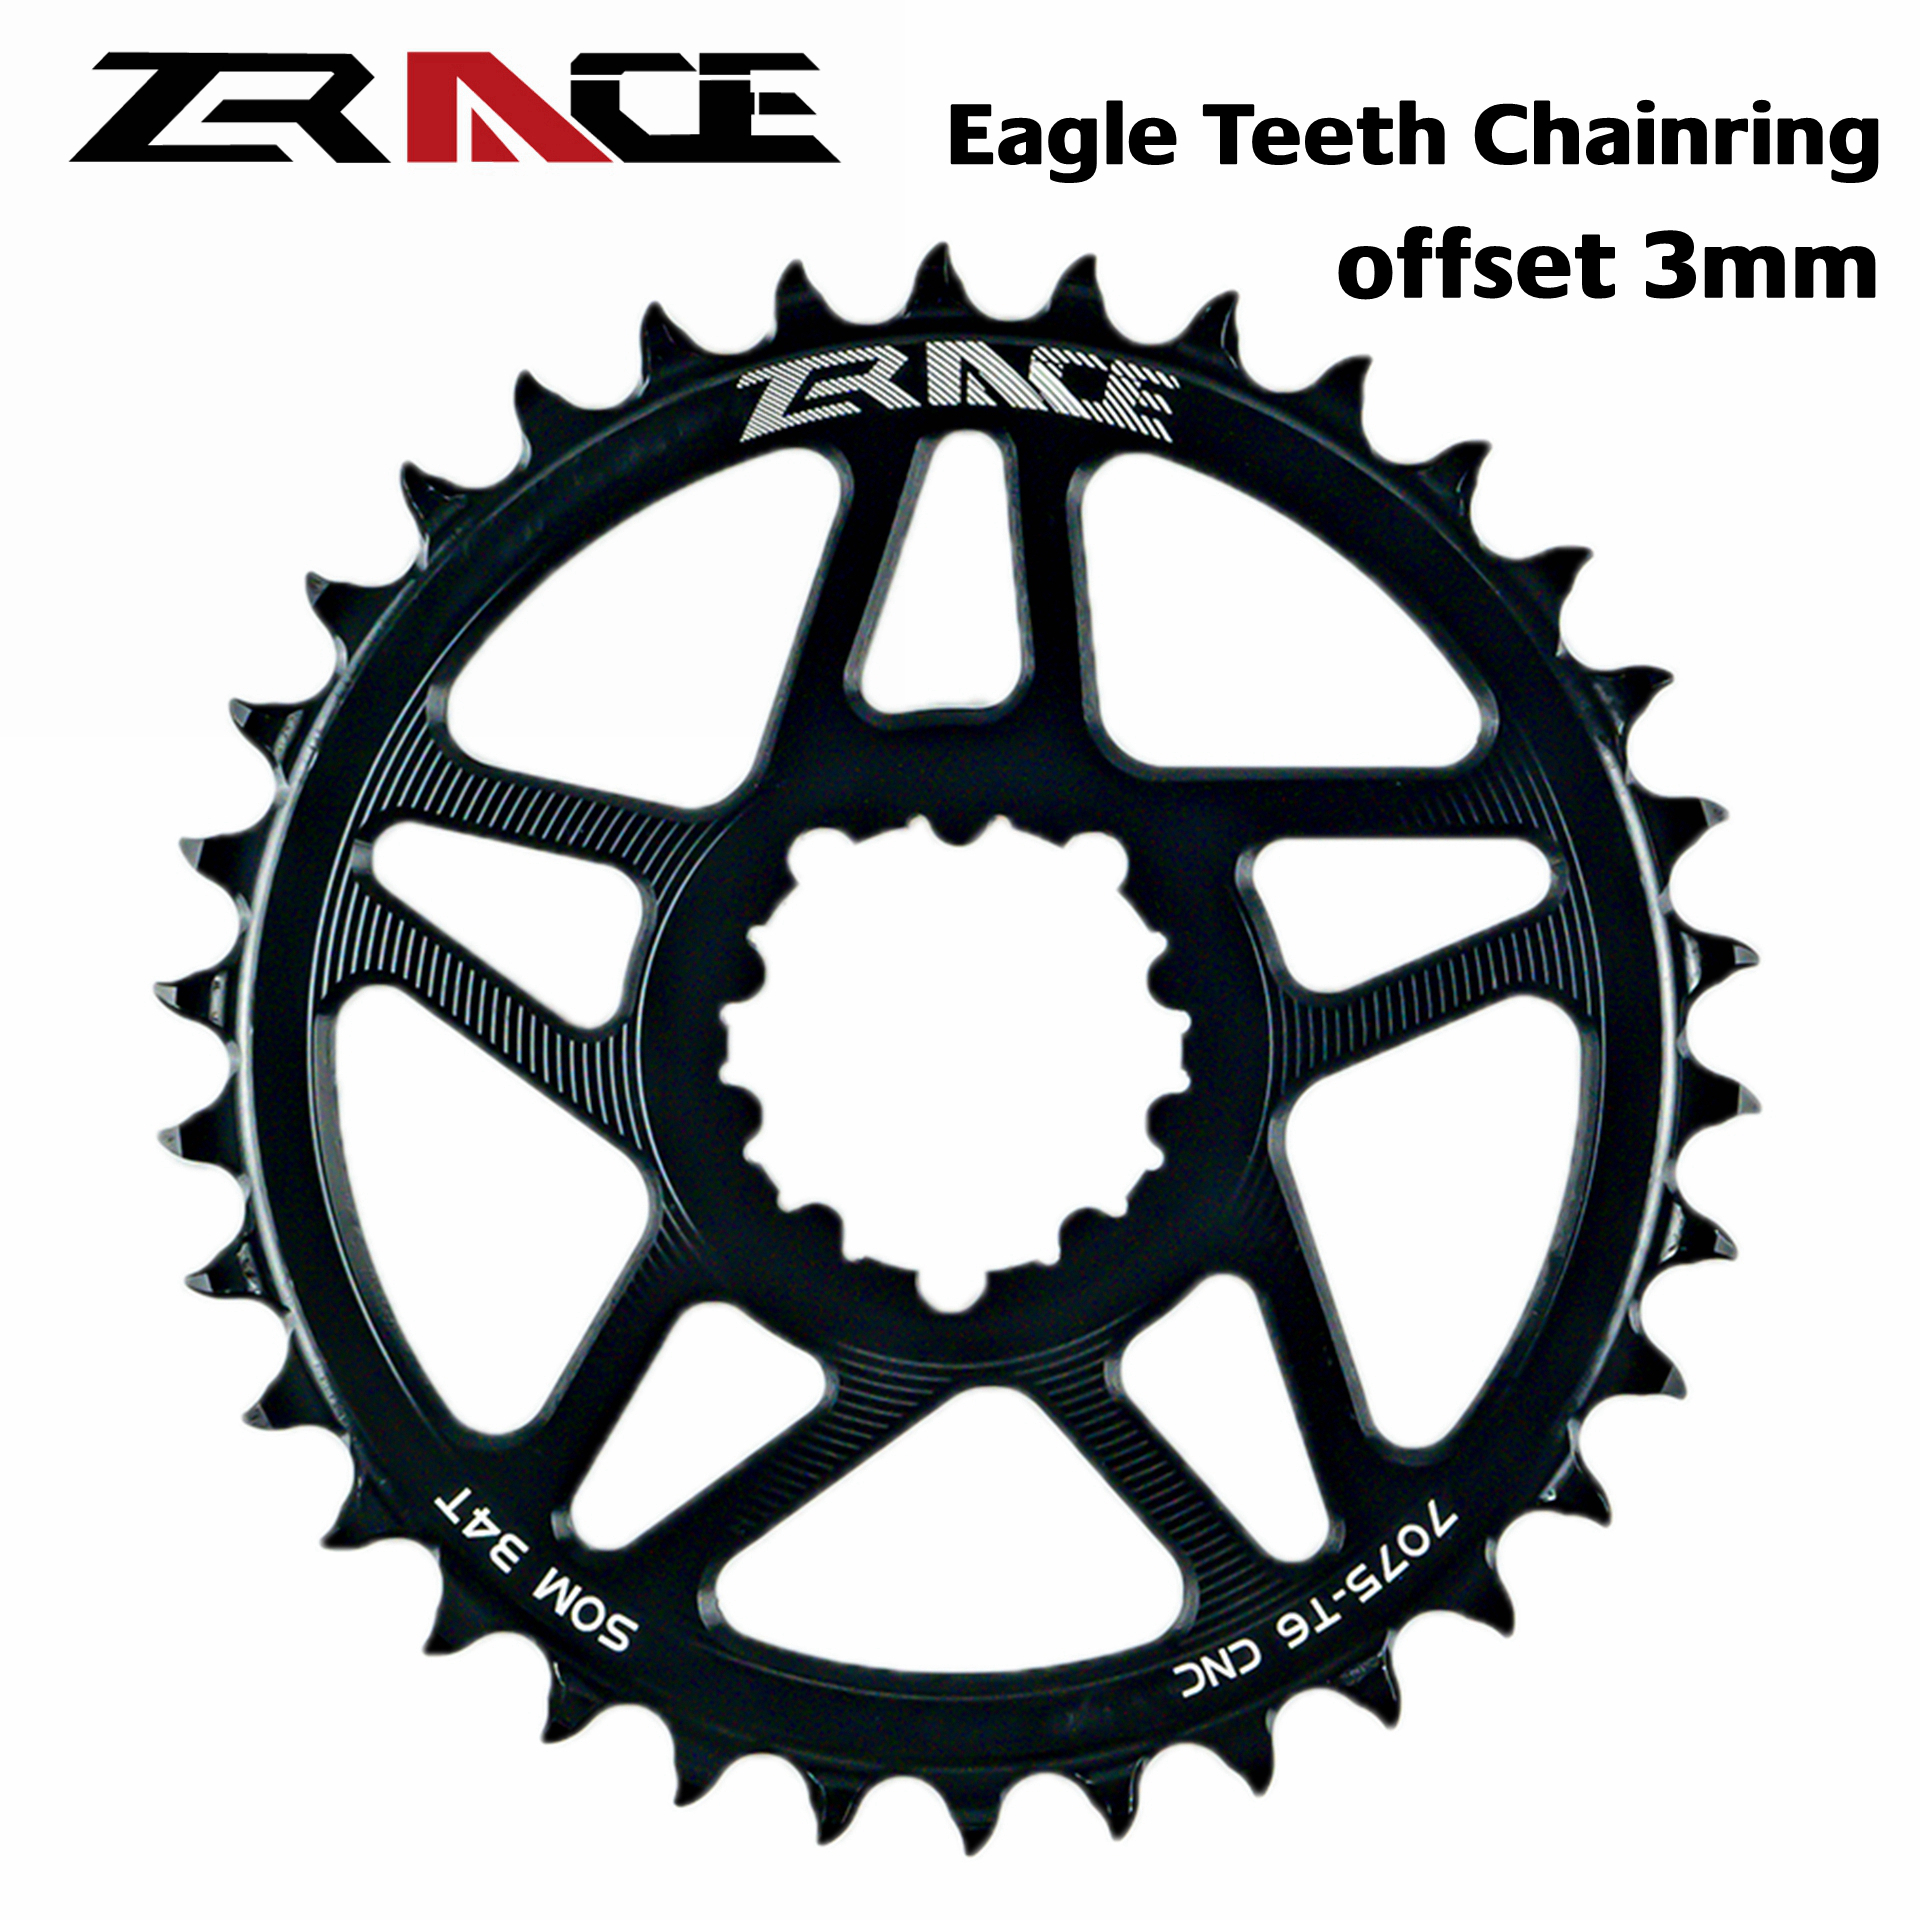 ZRACE Eagle Chainring 32T 34T 36T DM 3mm Offset Black Fit Sram 3mm offset 10S 11